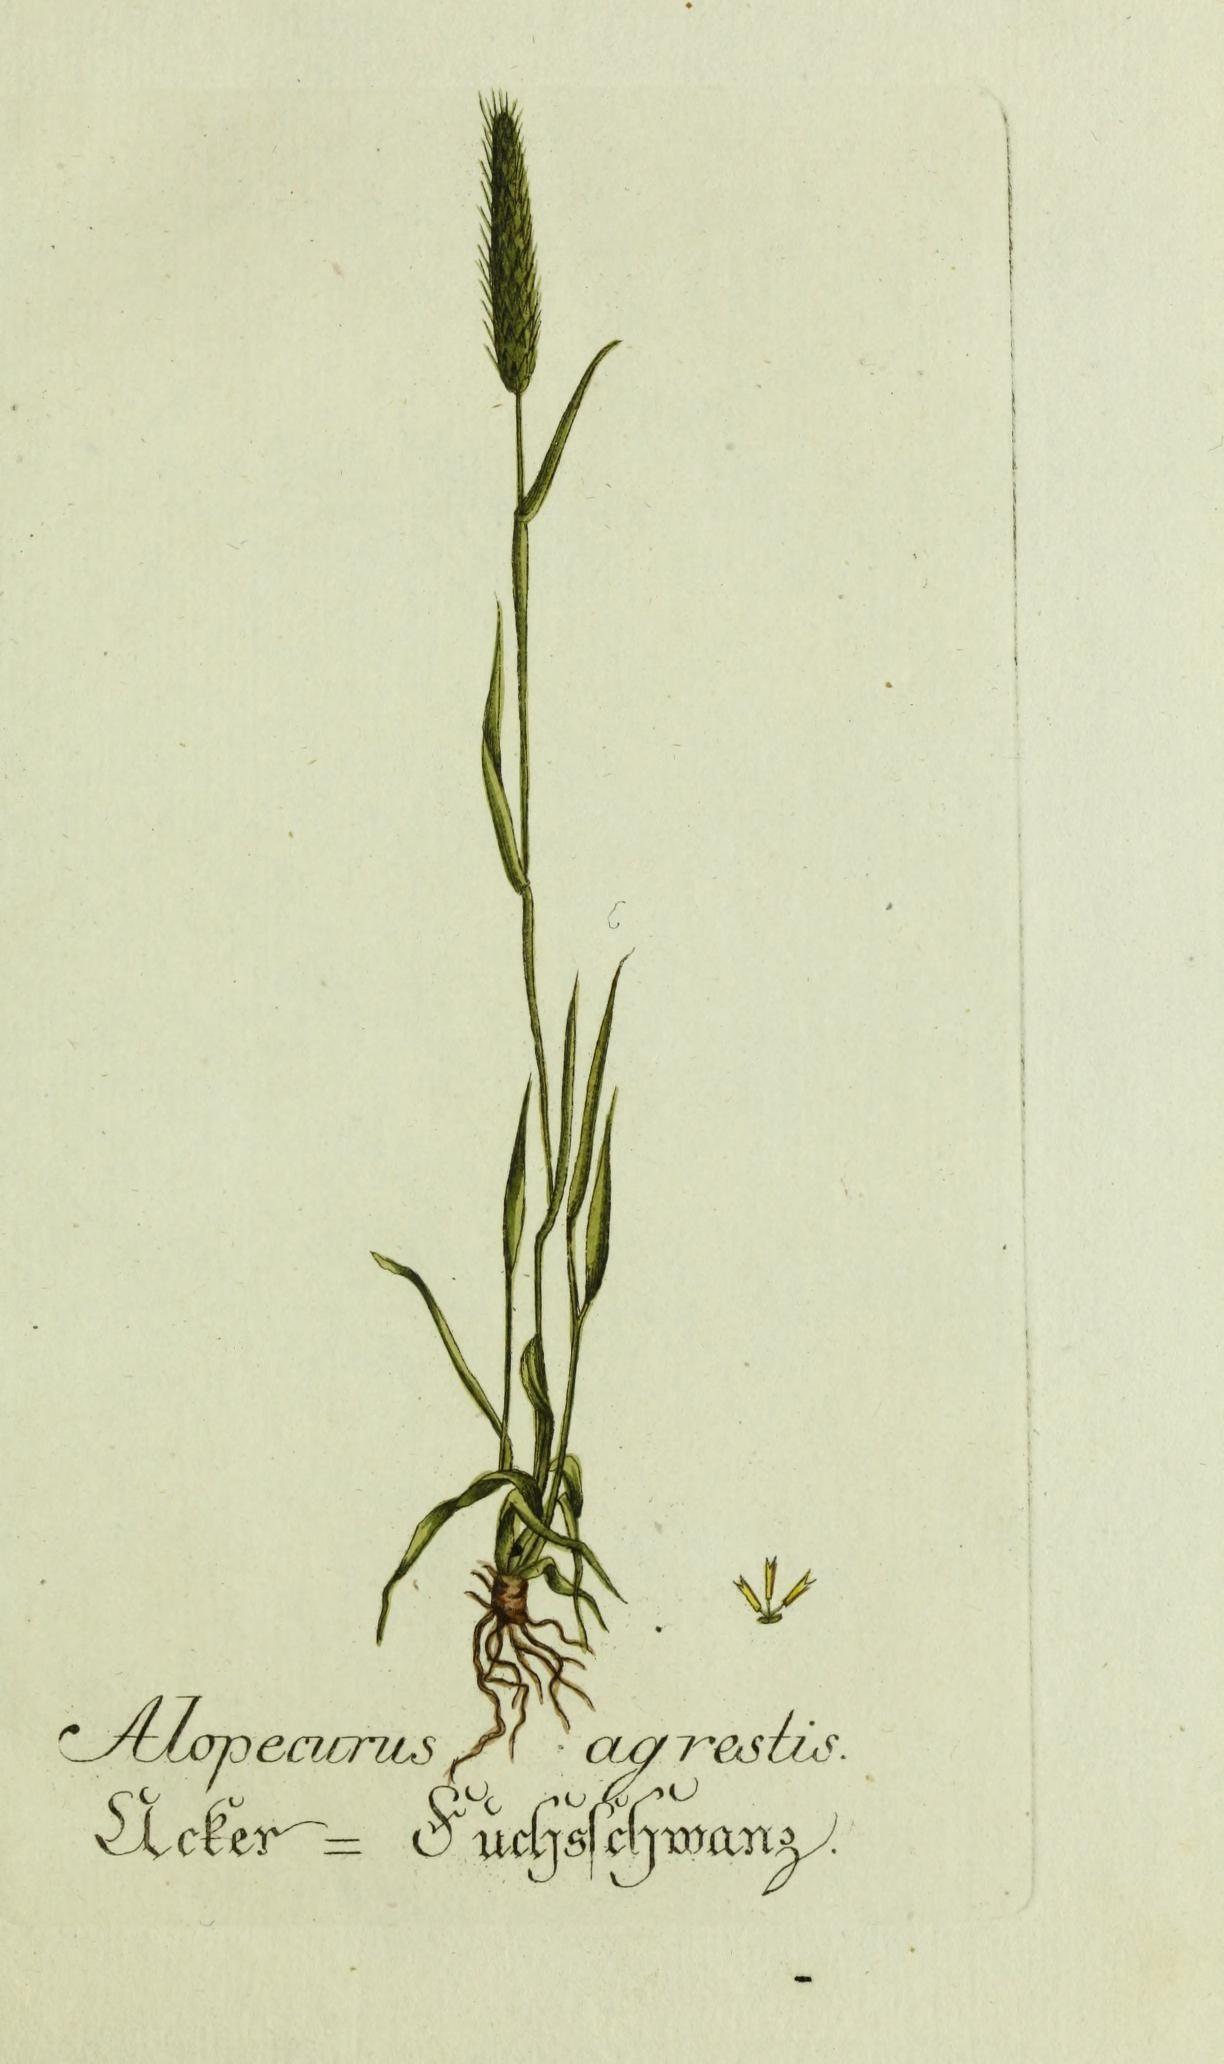 slender meadow foxtail - Encyclopedia of Life